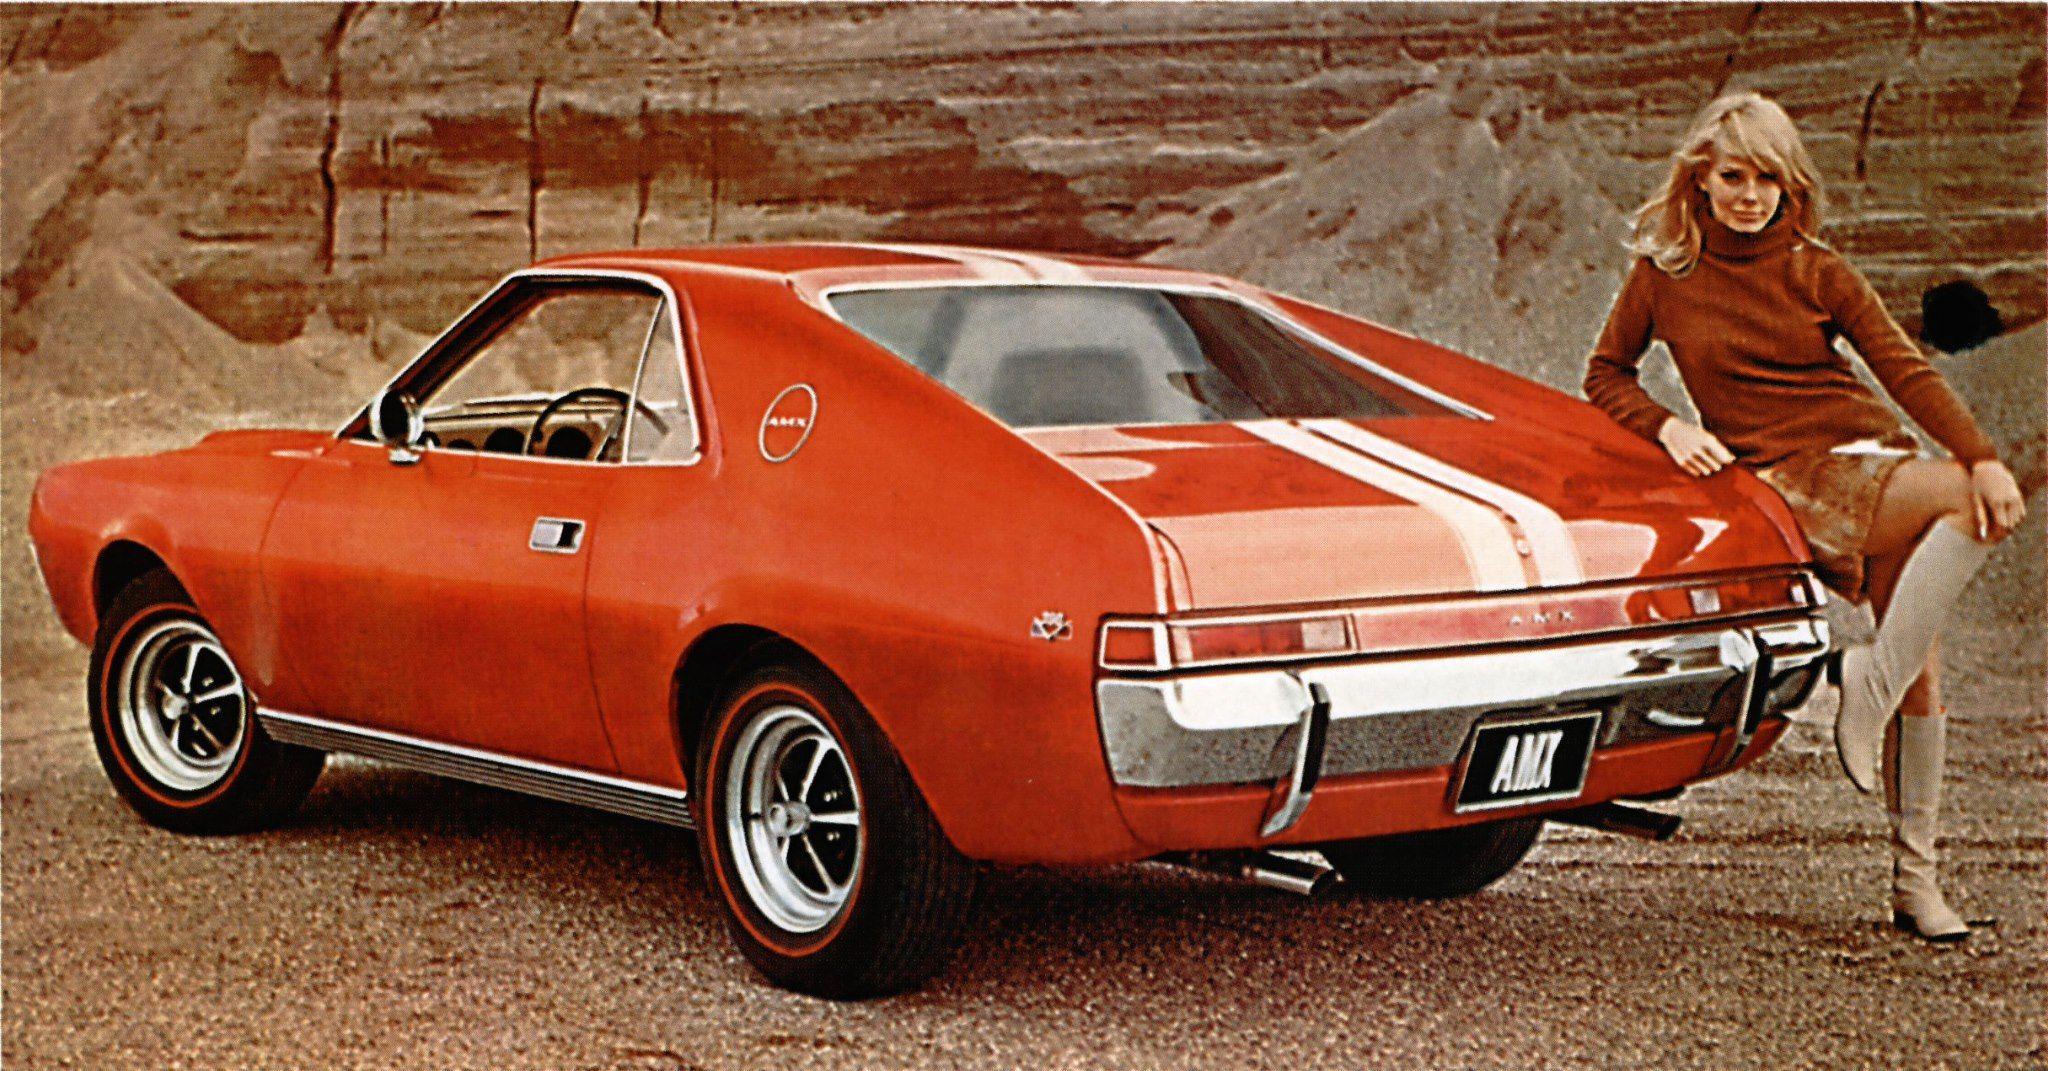 Amc Amx 1968 American Motors Vintage Sports Cars Cool Cars